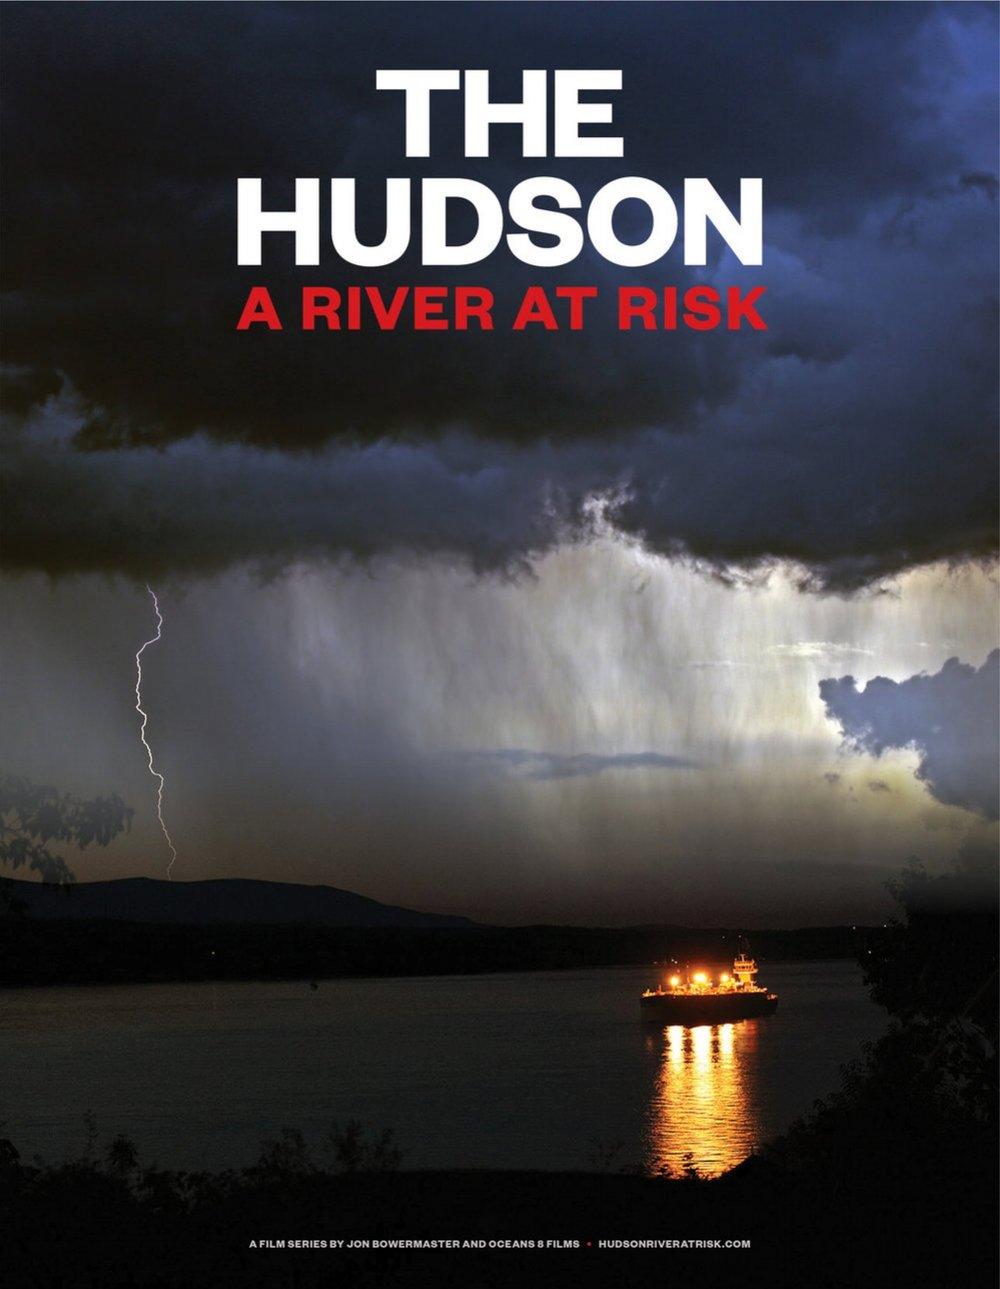 Hudson River at Risk environmental film series